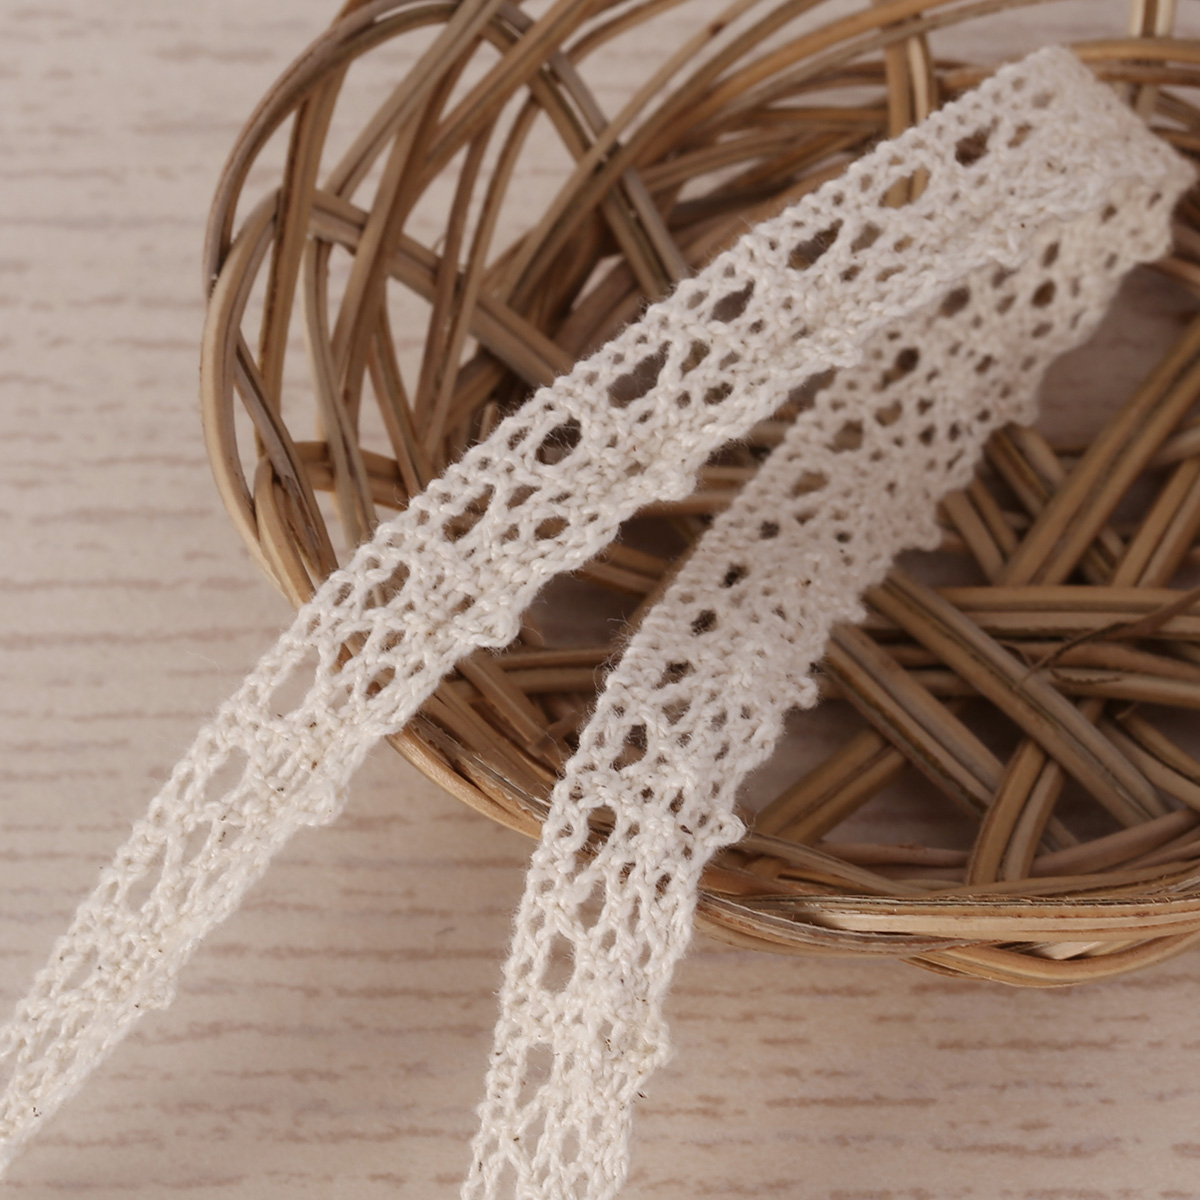 10m vintage cream lace bridal wedding trim ribbon craft cotton crochet gift diy ebay. Black Bedroom Furniture Sets. Home Design Ideas